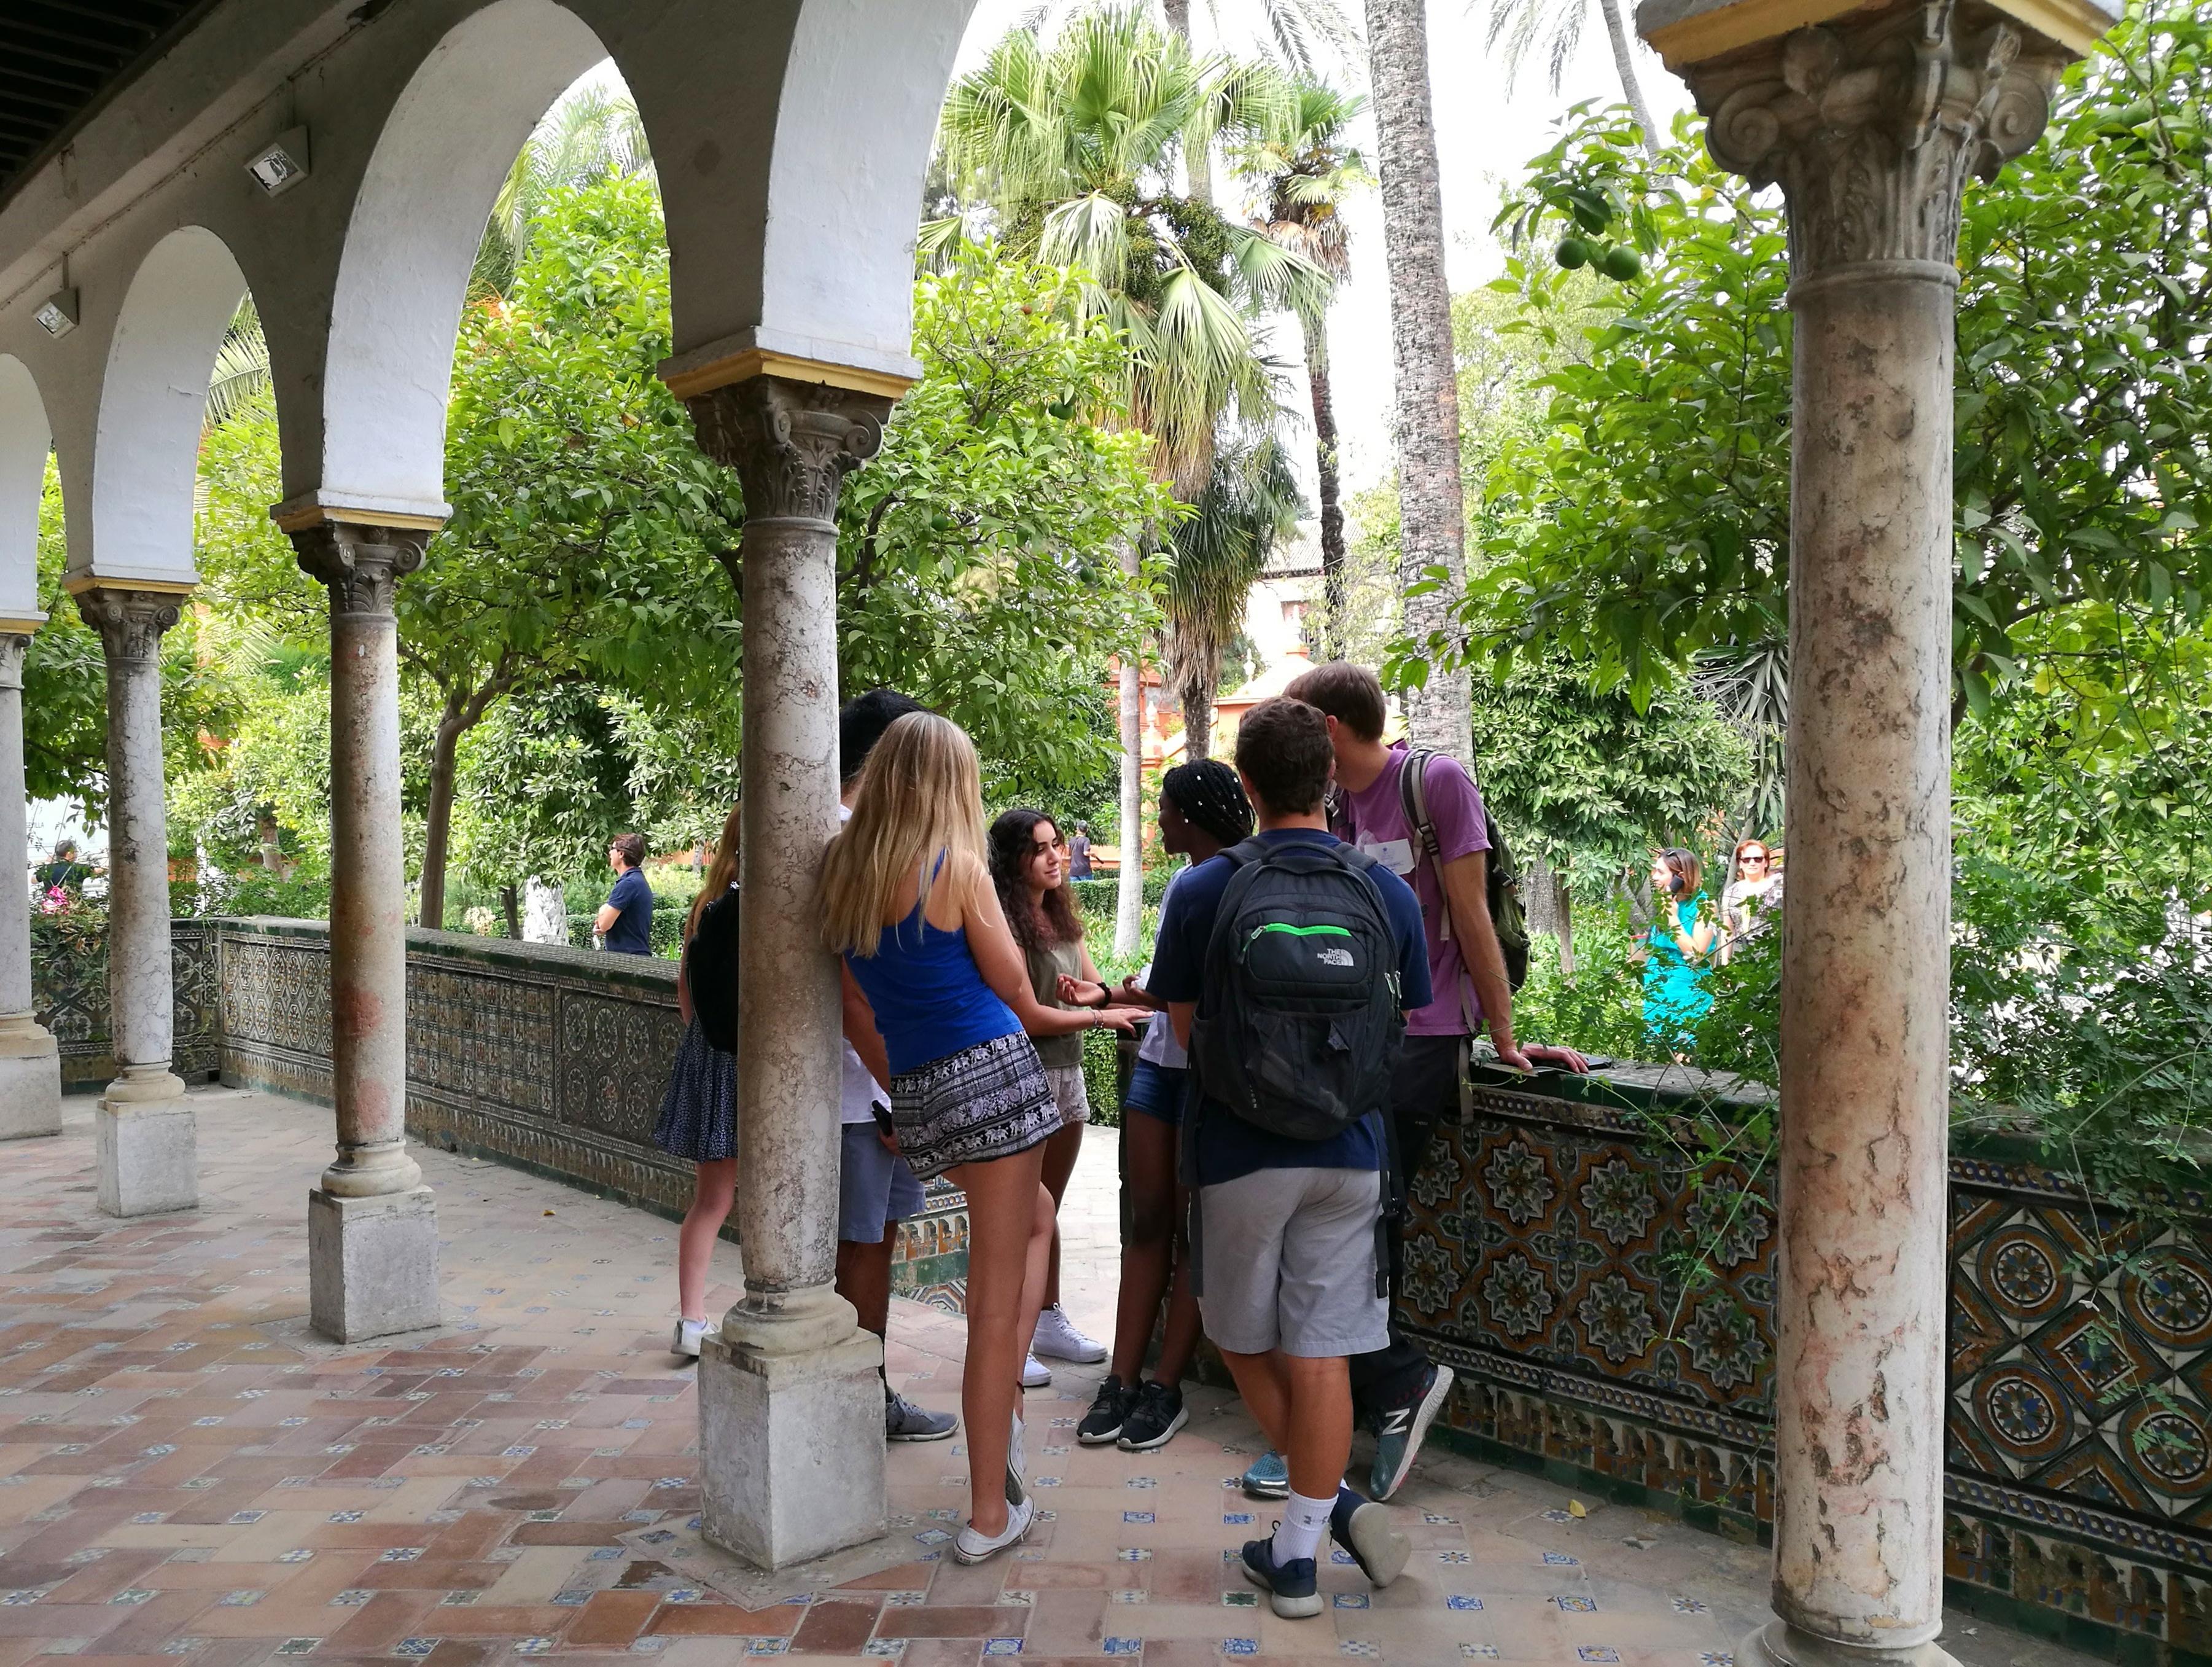 Proctor en Segovia visits the Alcázar of Sevilla